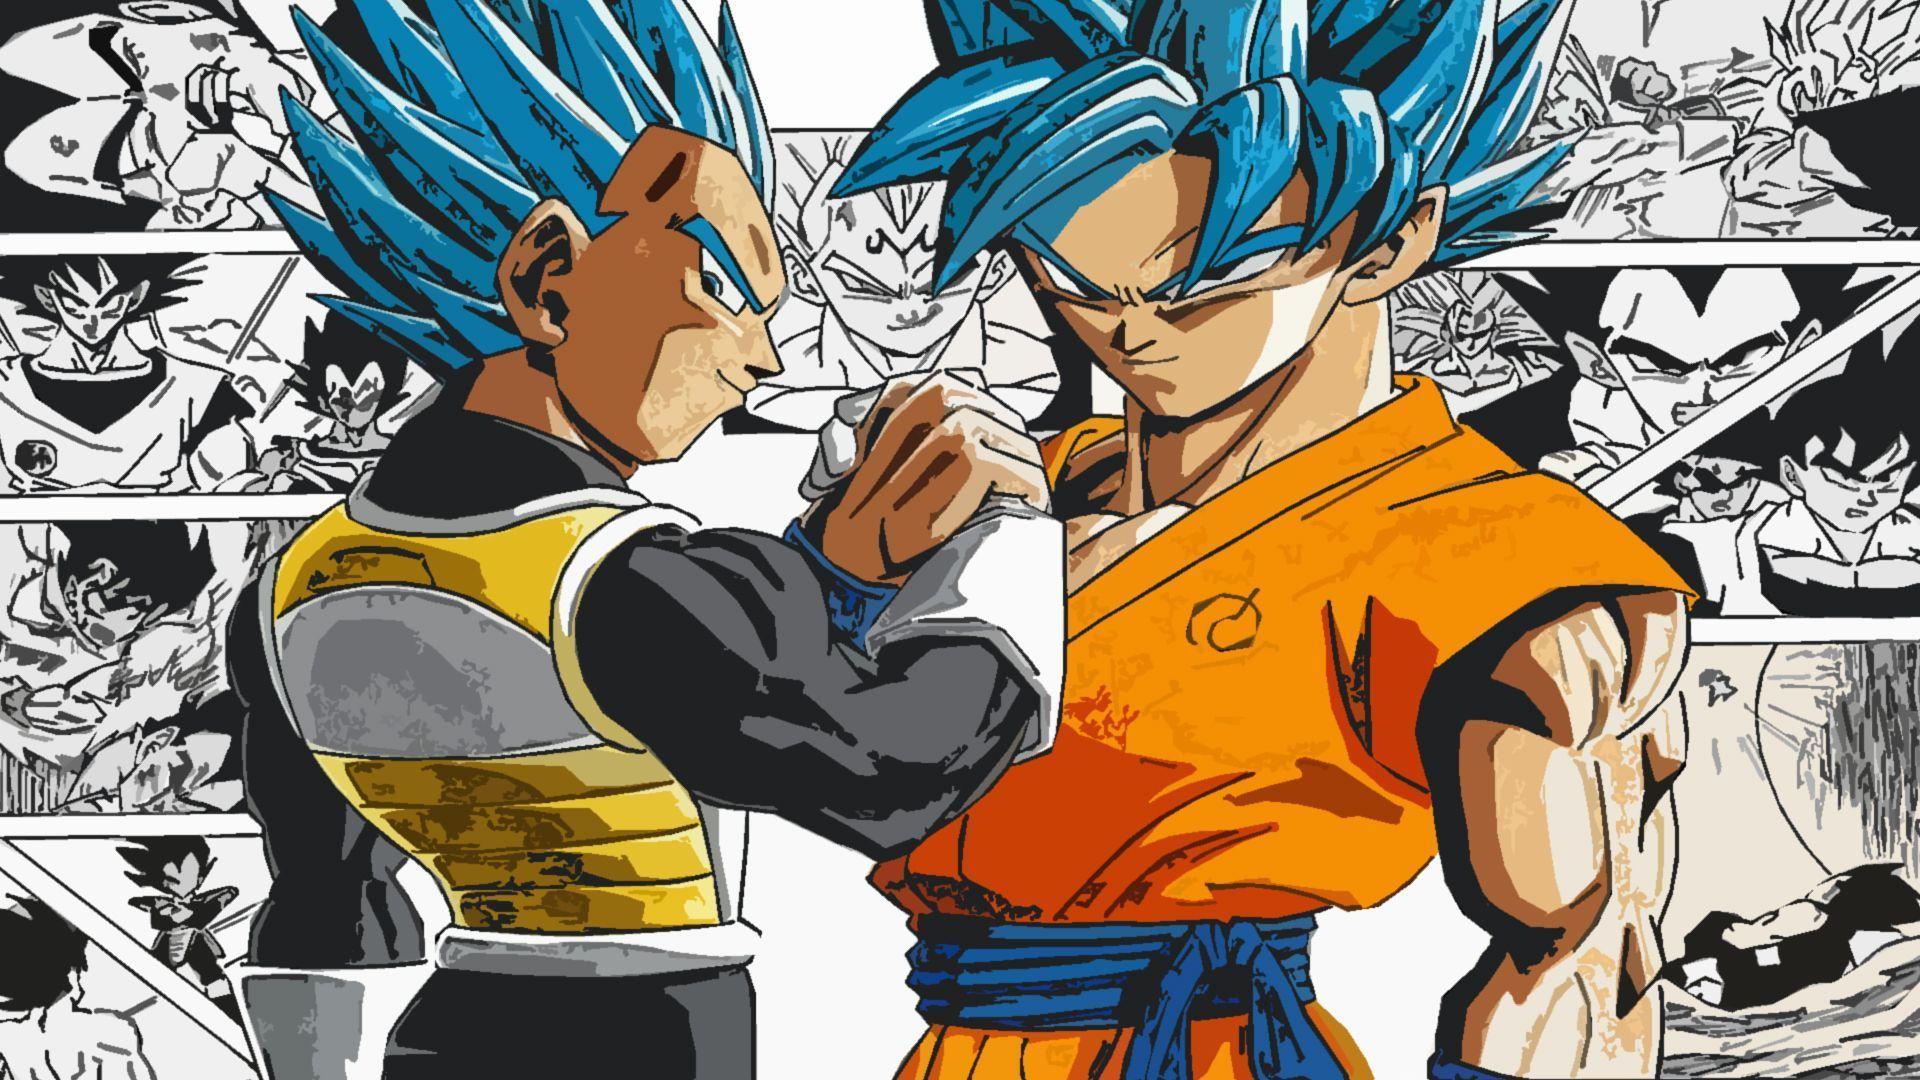 Goku And Vegeta Wallpapers Top Free Goku And Vegeta Backgrounds